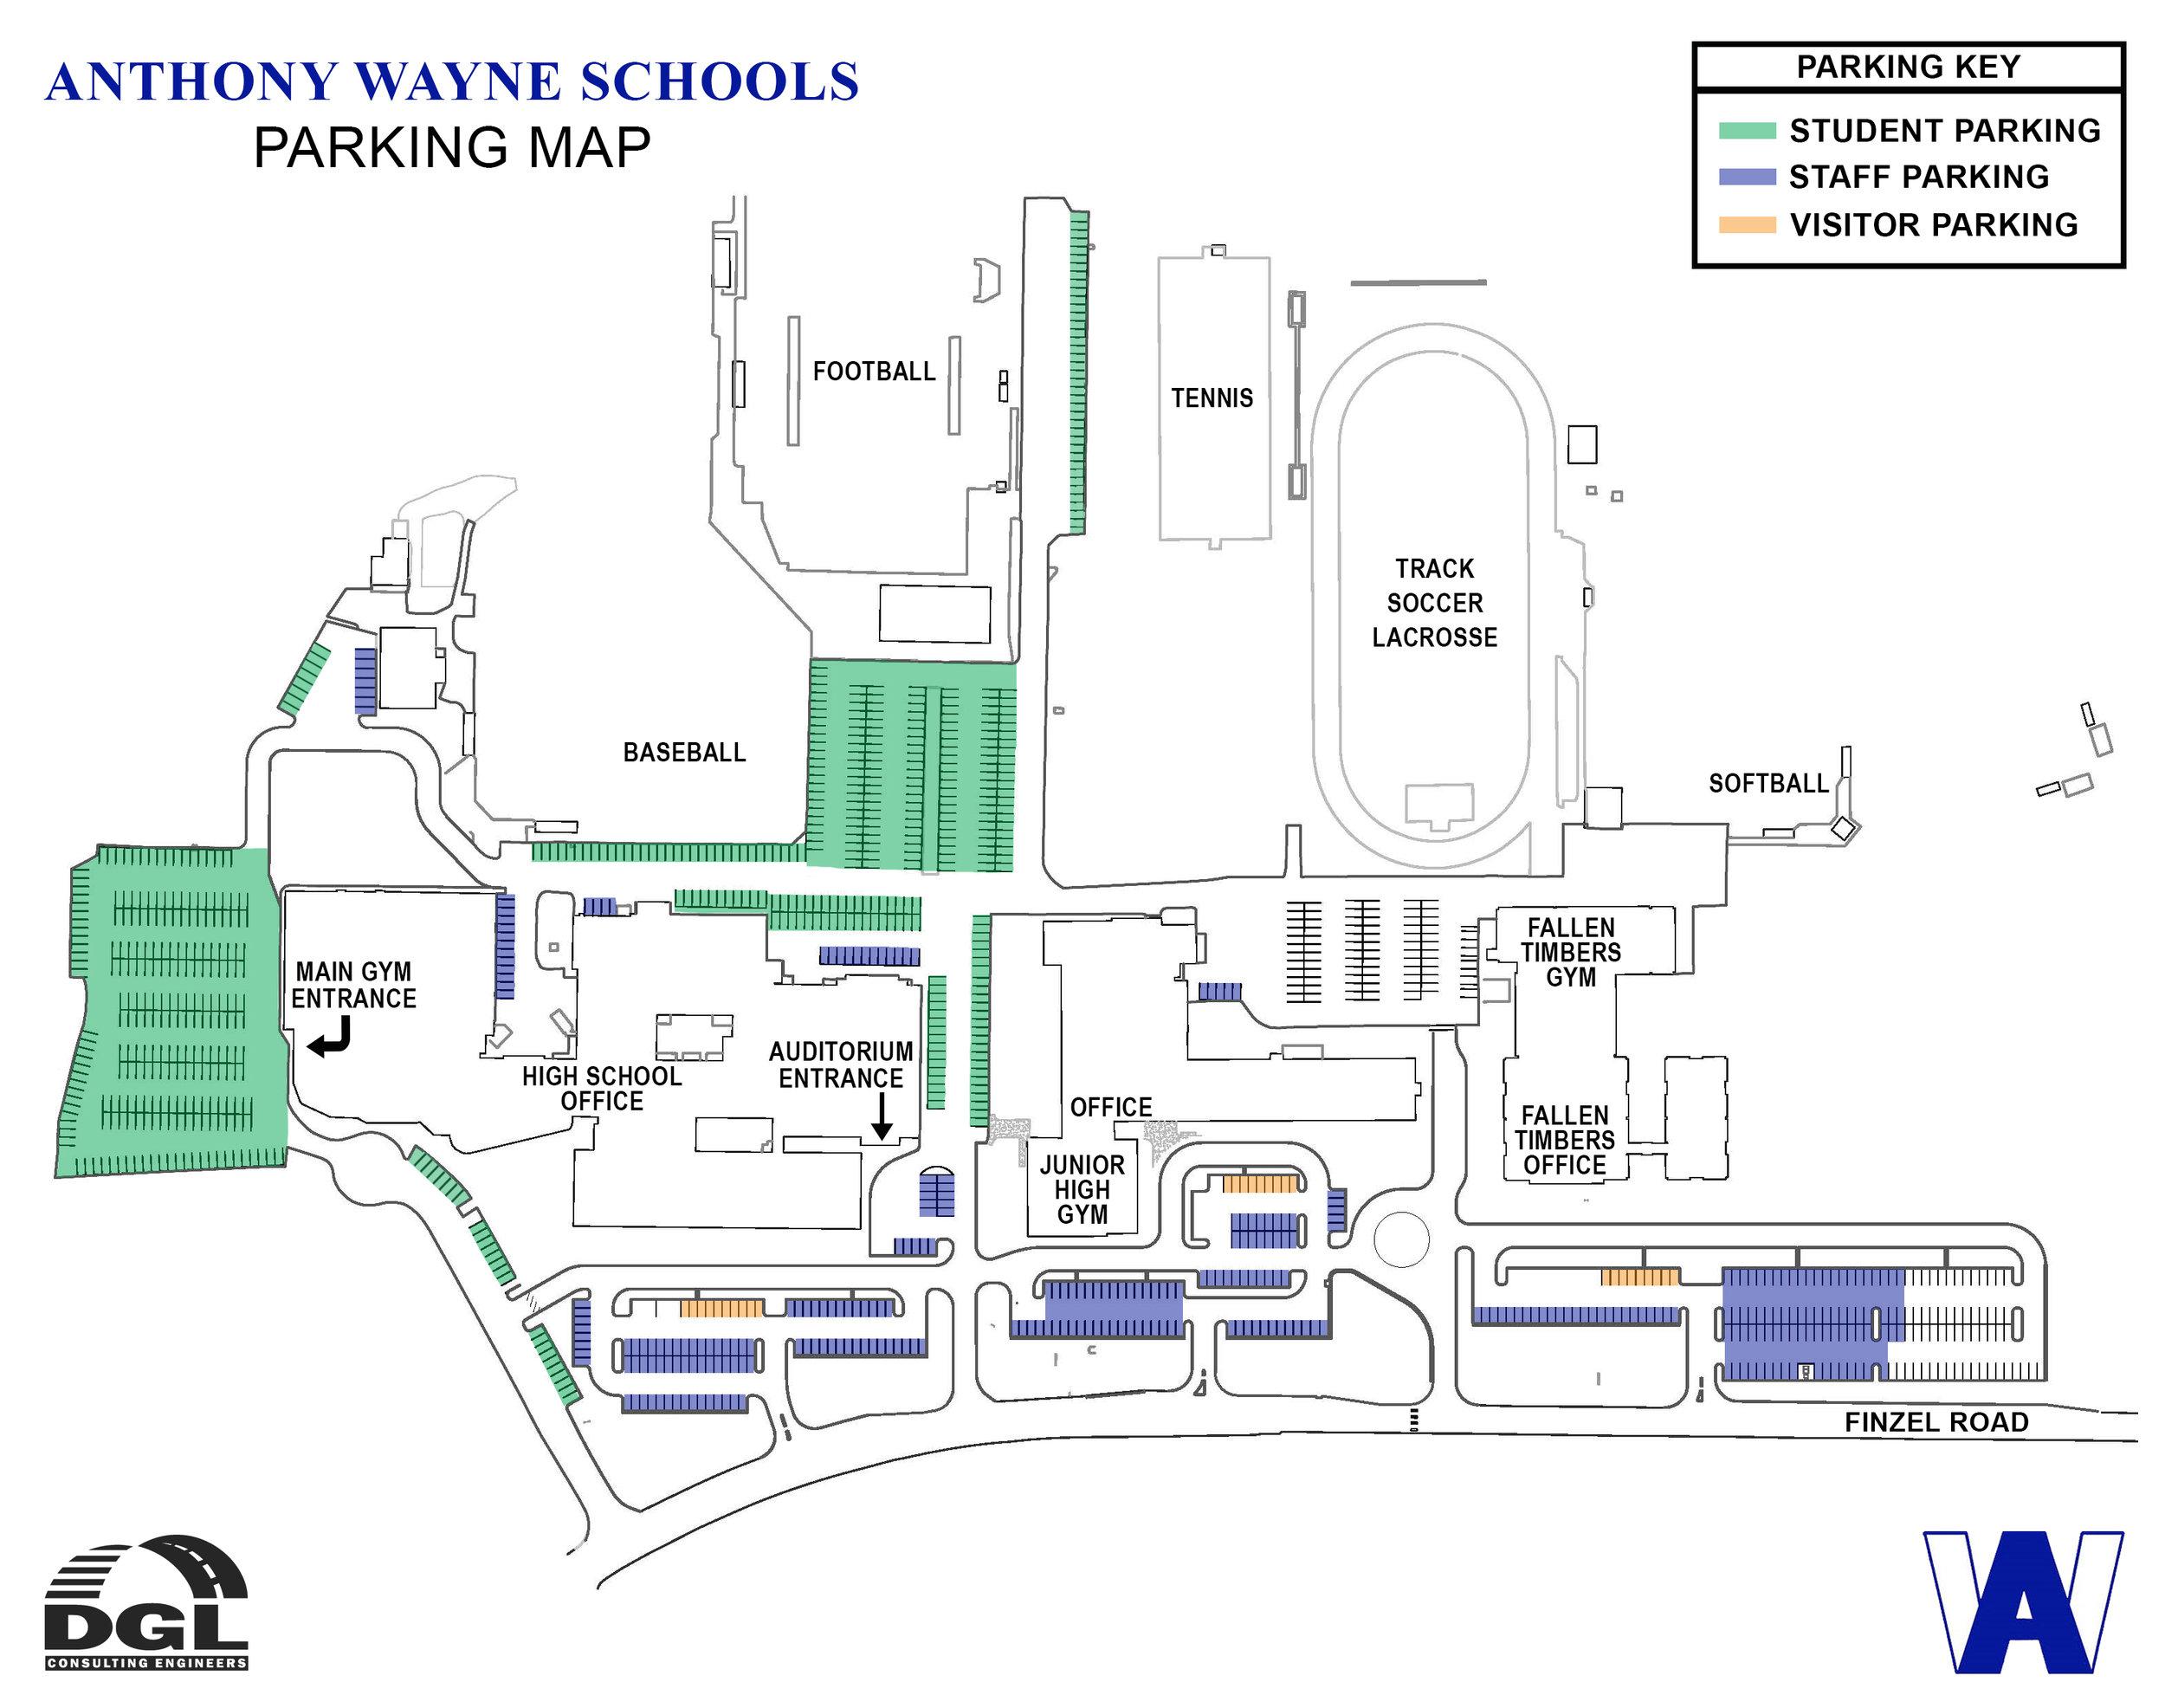 Anthony Wayne Schools Parking Map.jpg